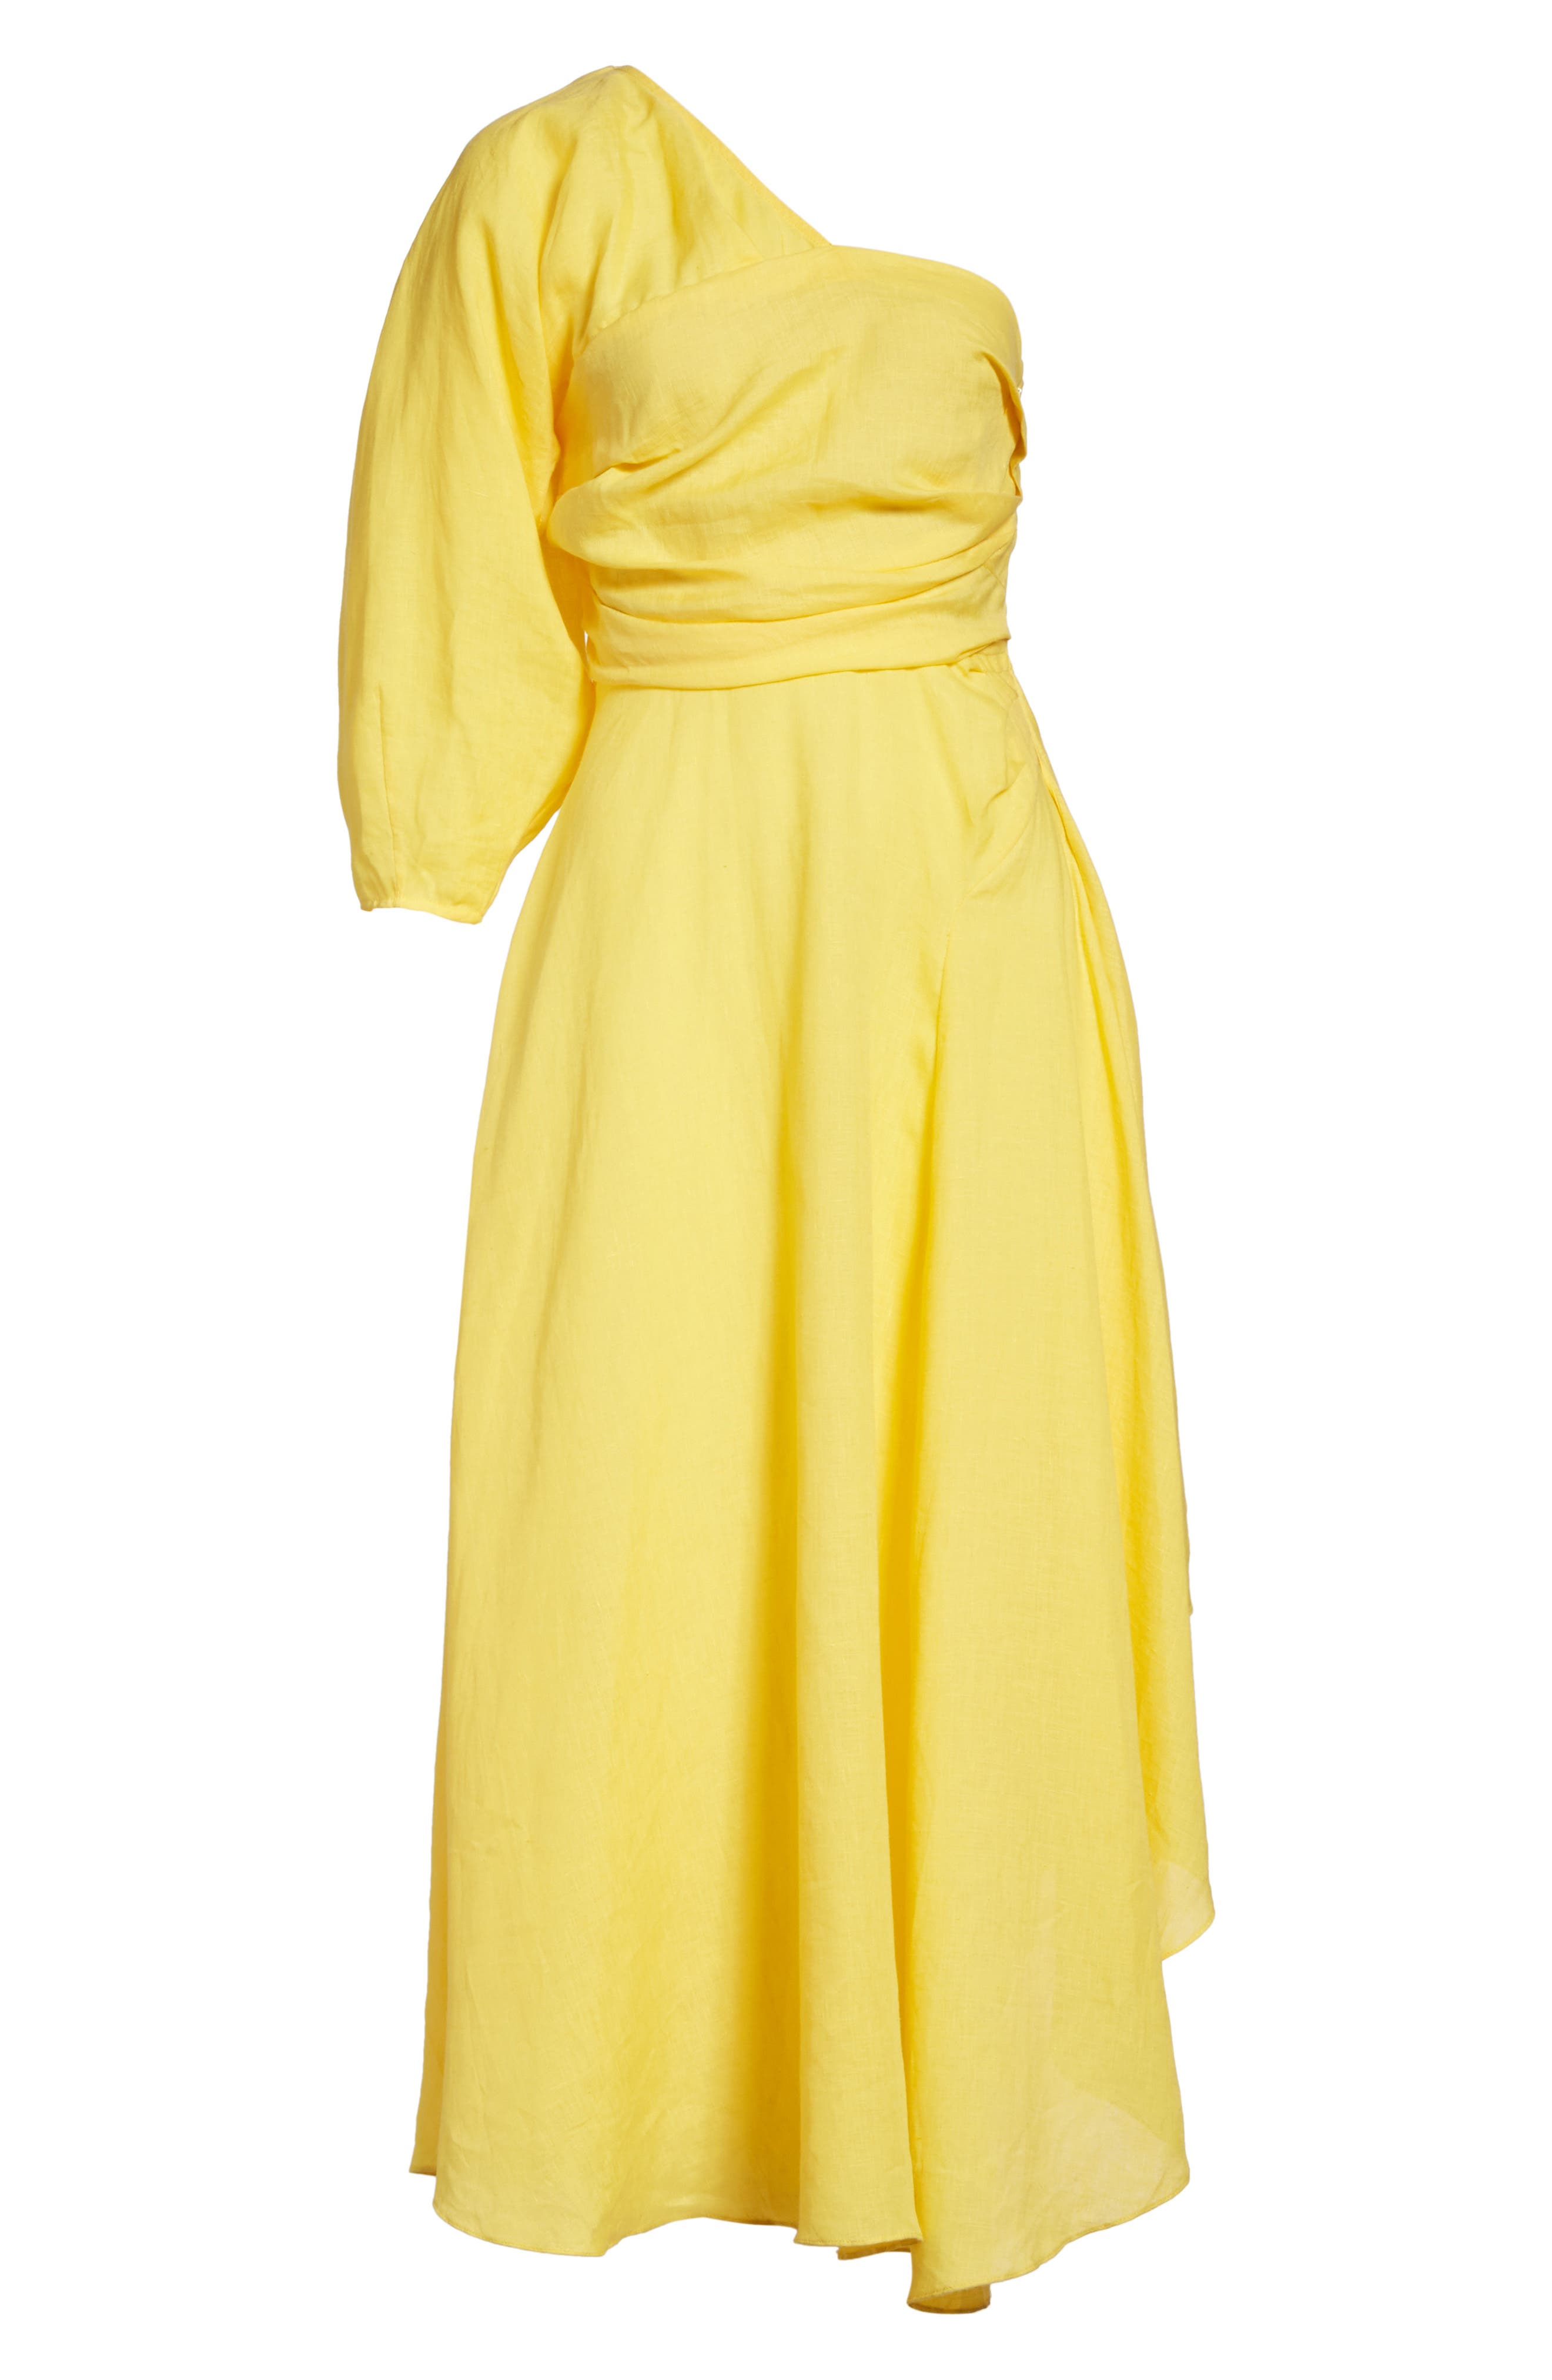 Tipple One-Shoulder Dress,                             Alternate thumbnail 6, color,                             YELLOW